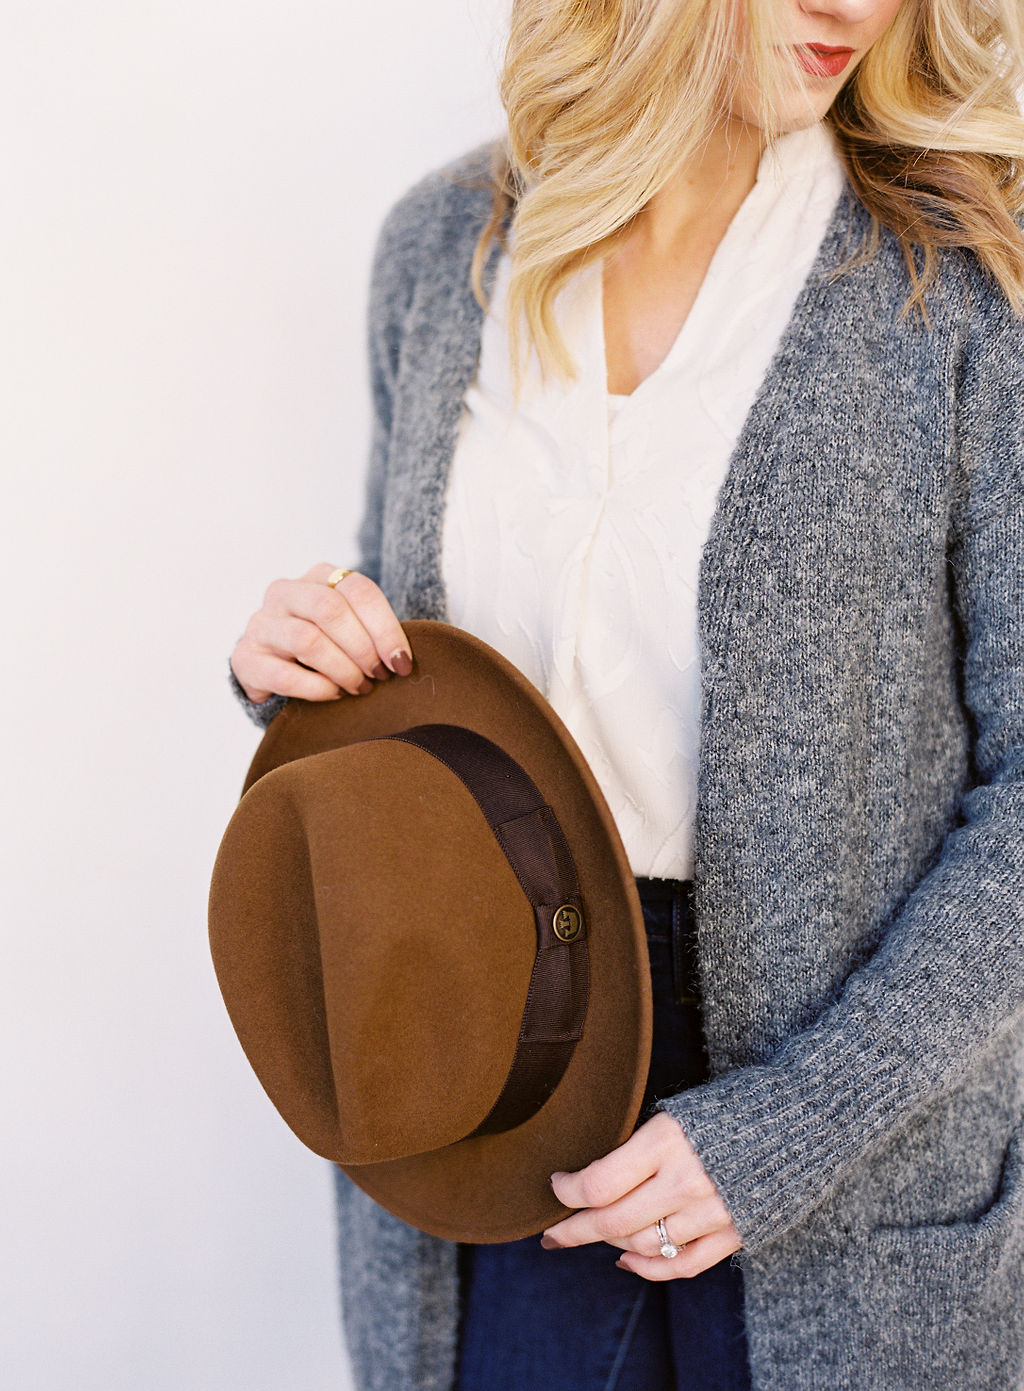 winter headshots with goorin hat